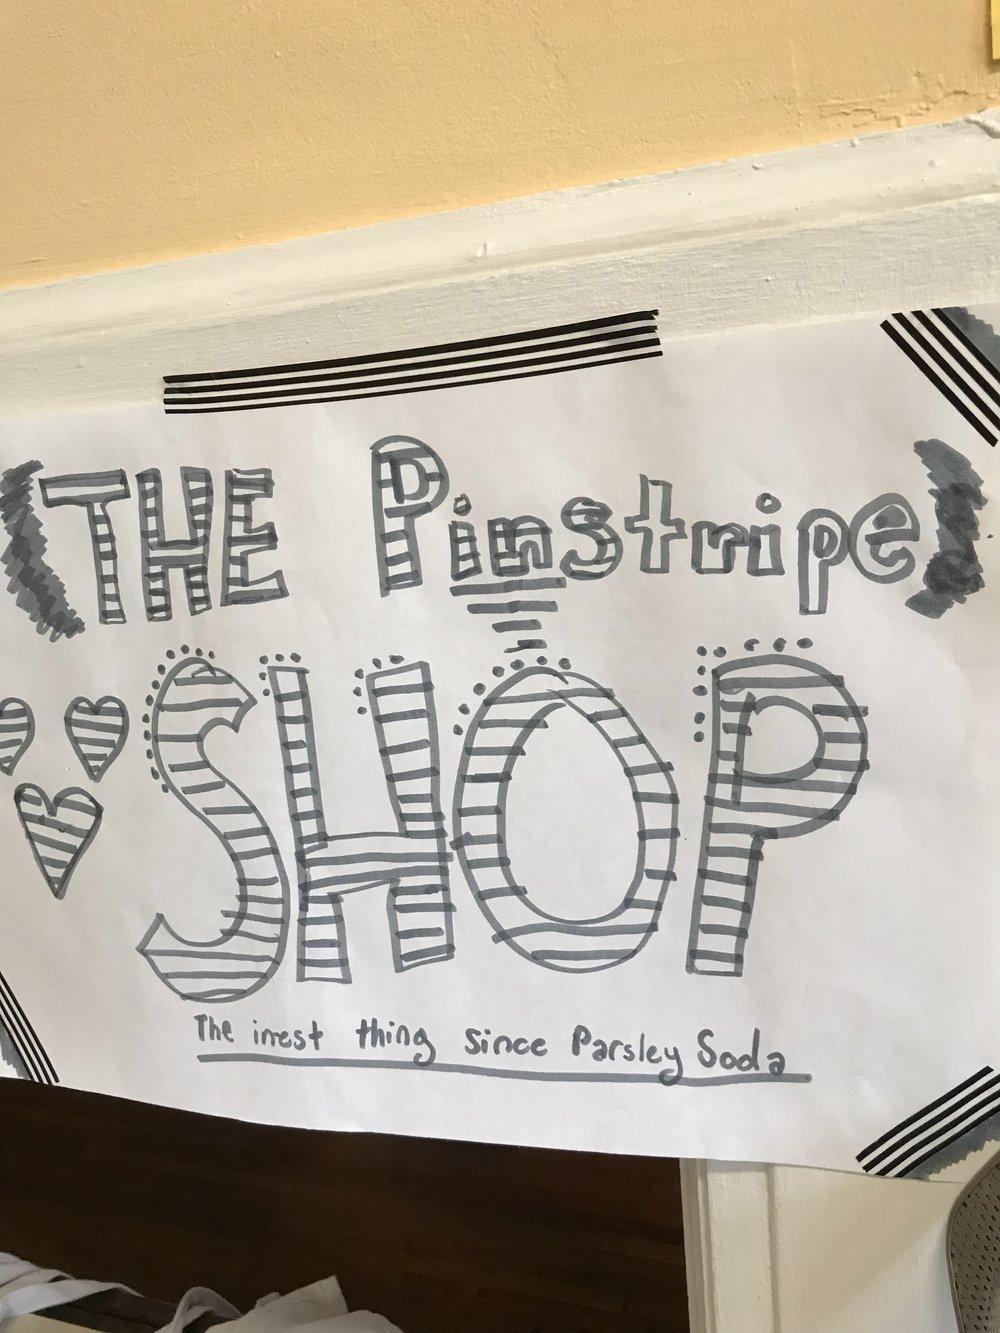 The Pinstripe Shop!